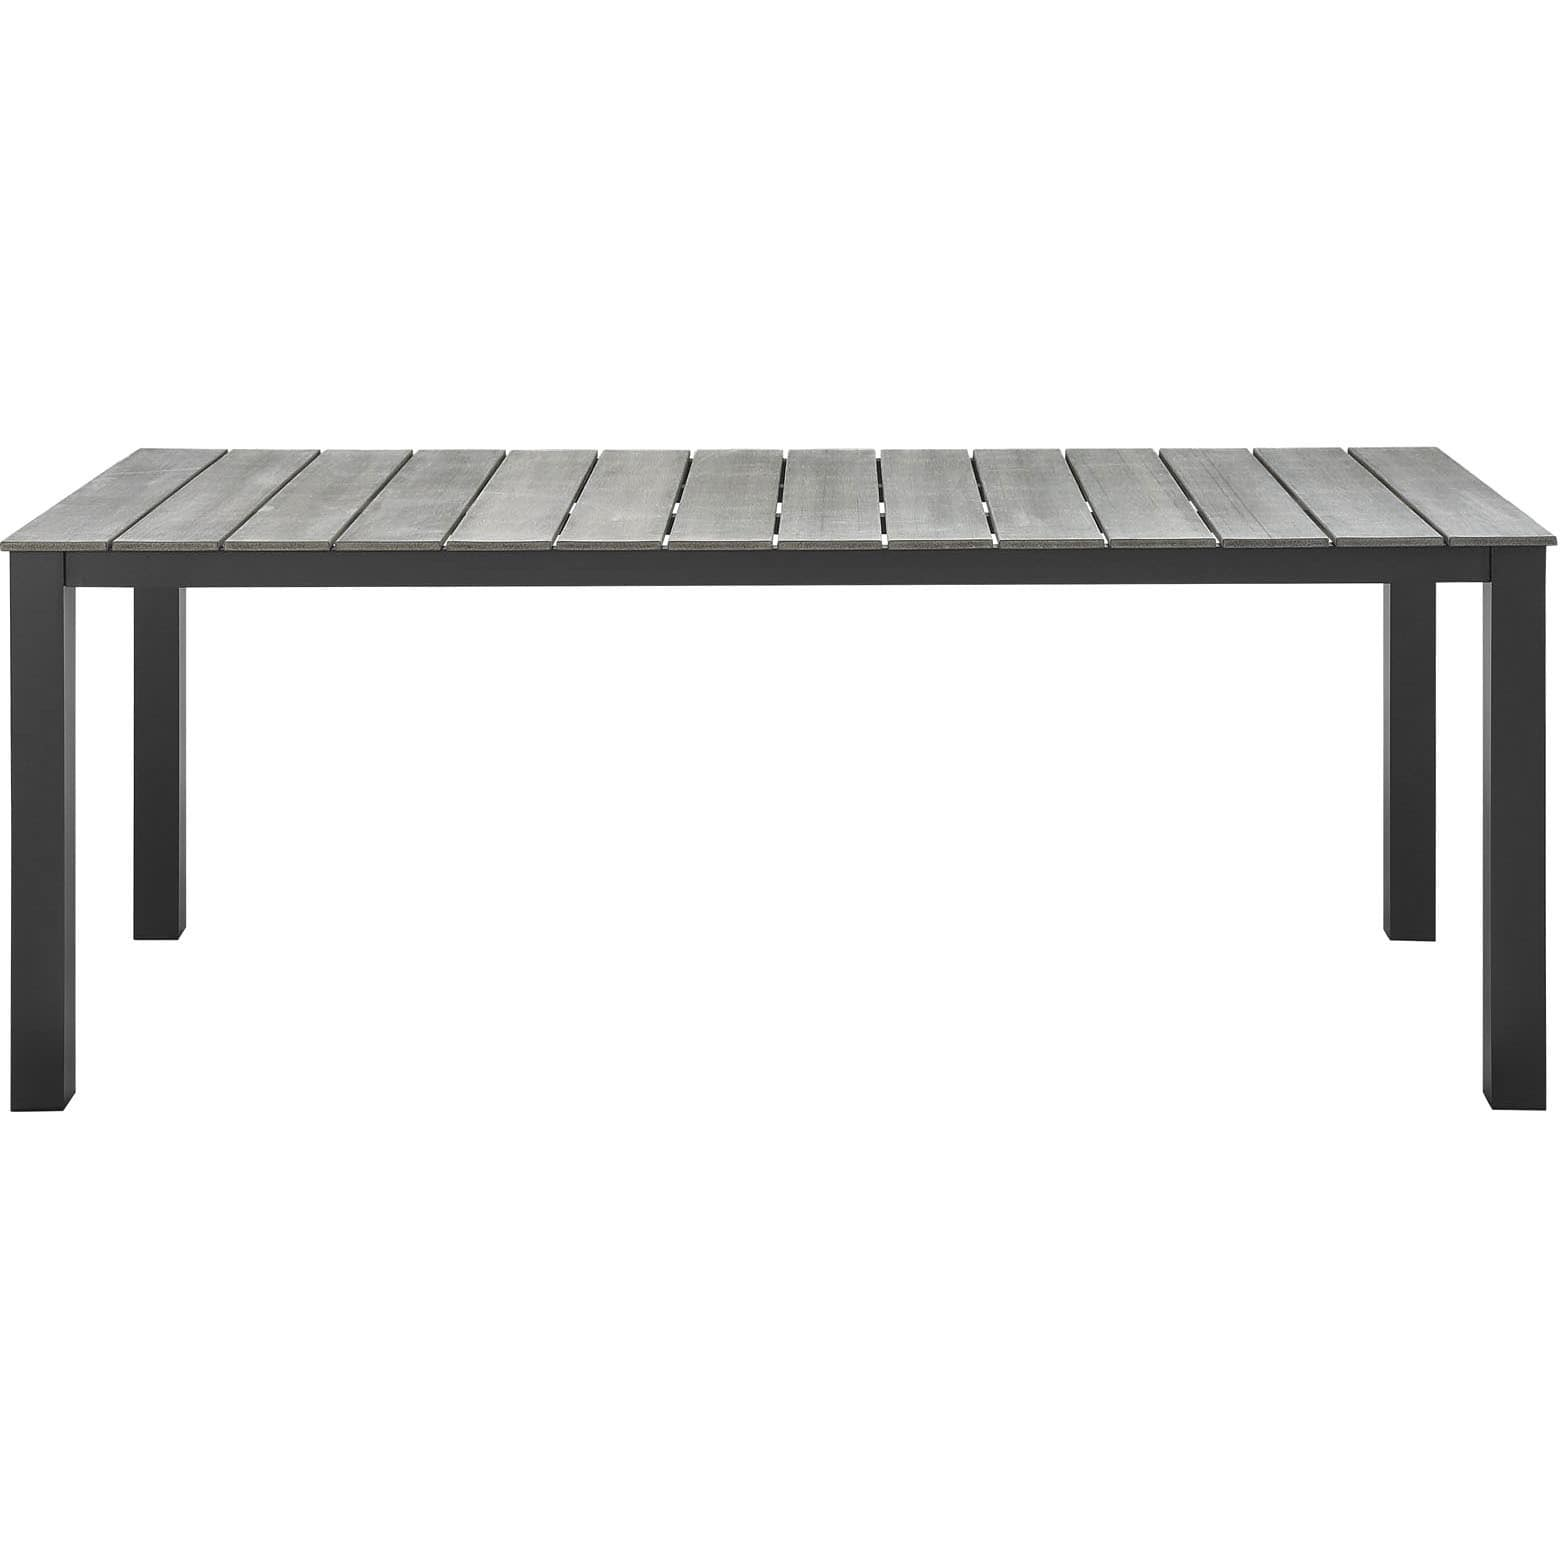 Modway Main 80 Inch Outdoor Patio Dining Table Walmartcom